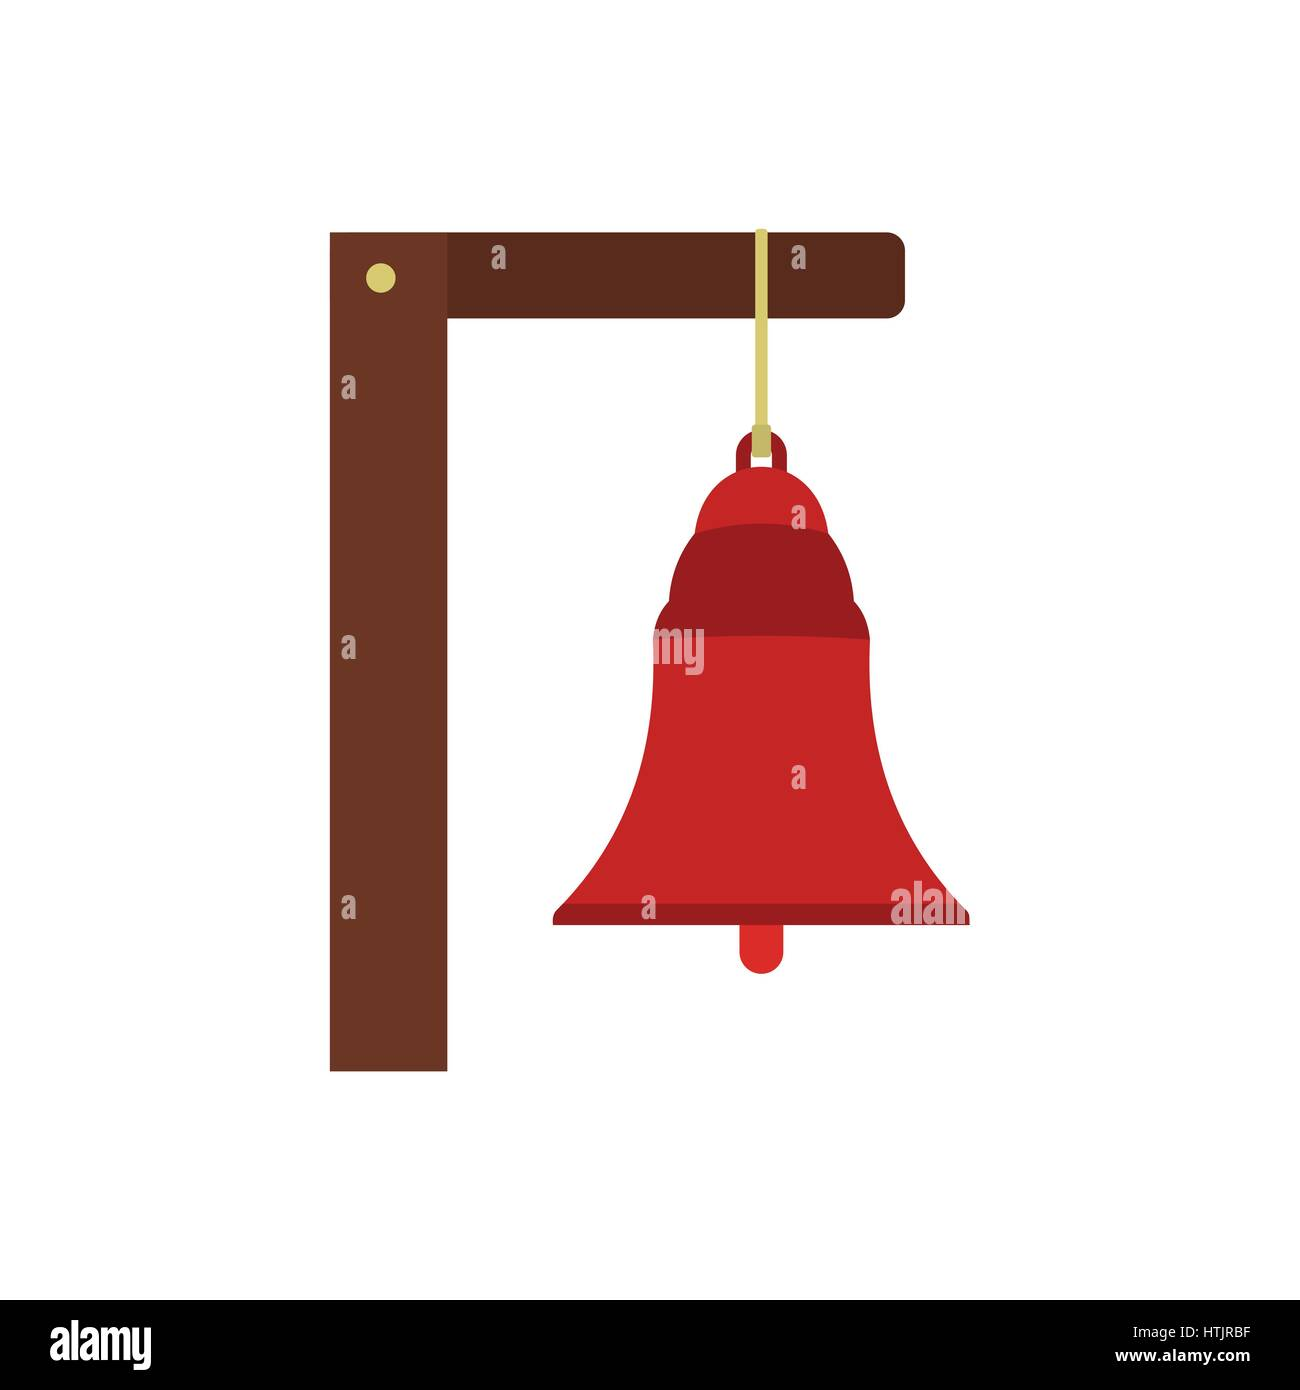 Alarm bell icon  - Stock Image